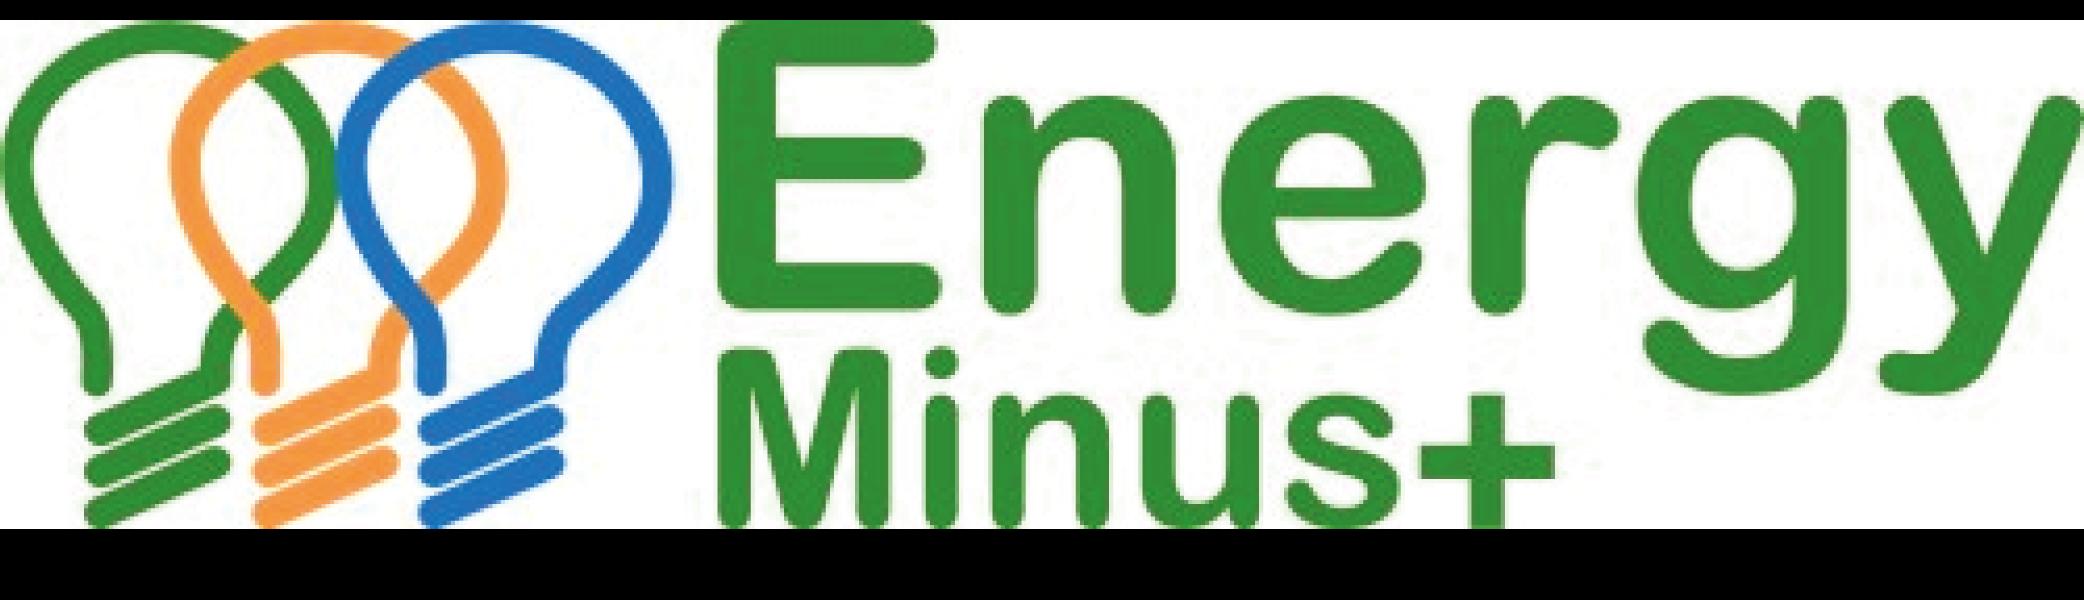 Logo energy Minus+